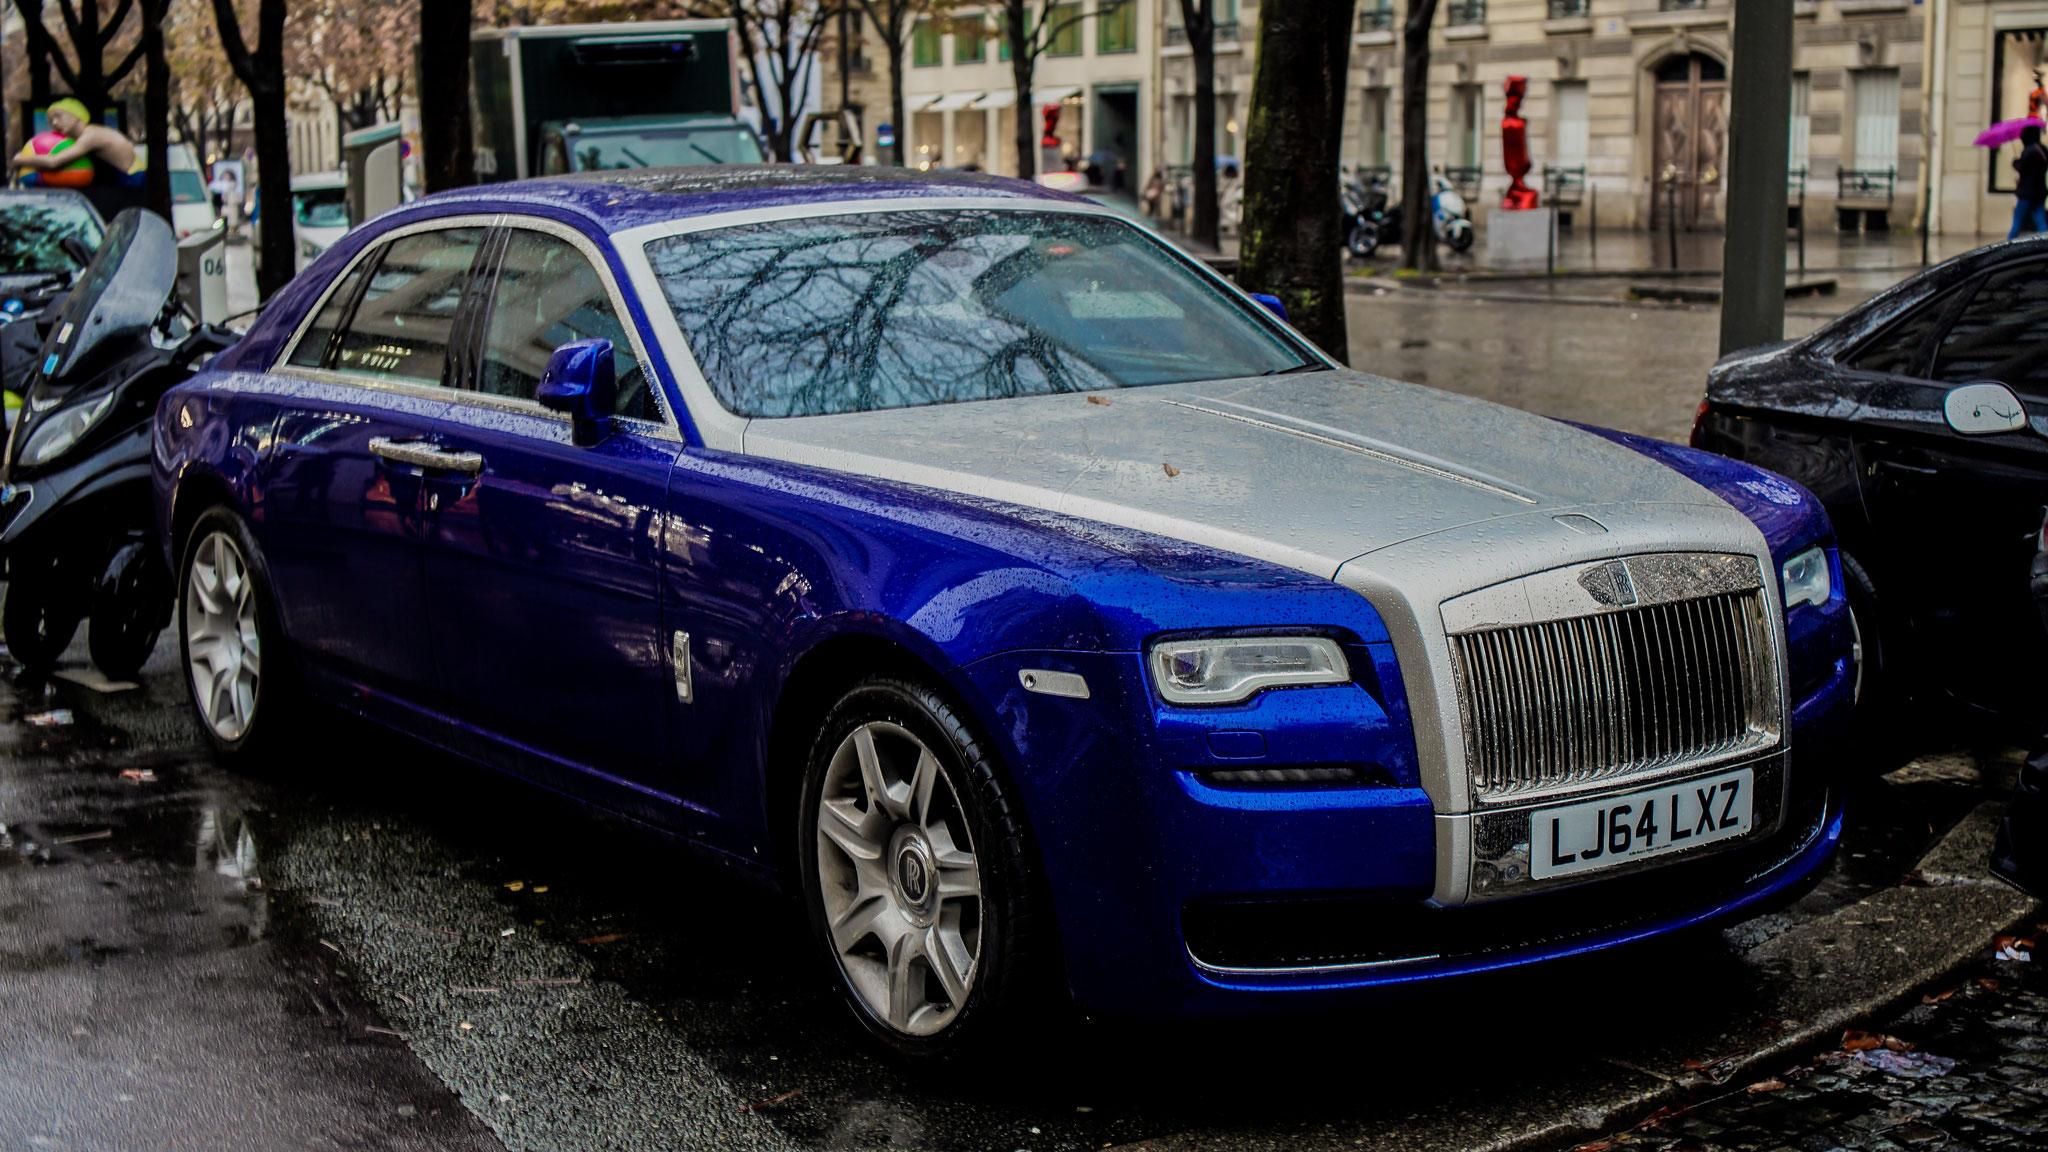 Rolls Royce Ghost Series II - LJ64-LXZ (GB)